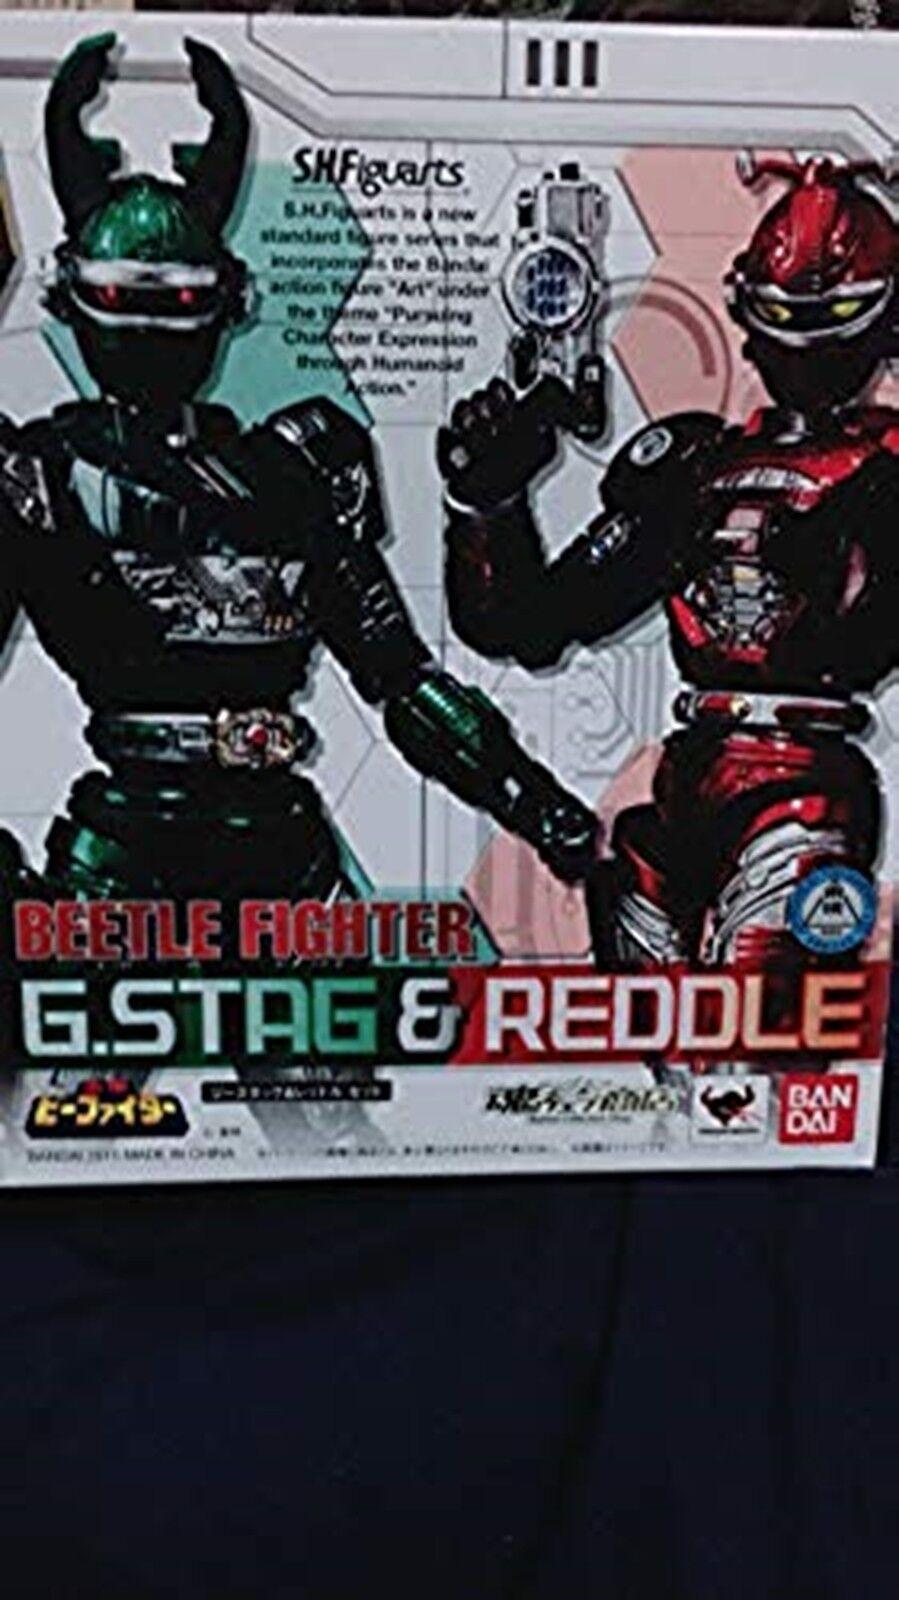 Bandai S. H. FIGUARTS Jyukou B-Fighter G Soltero&rojodle Set Figura de Acción